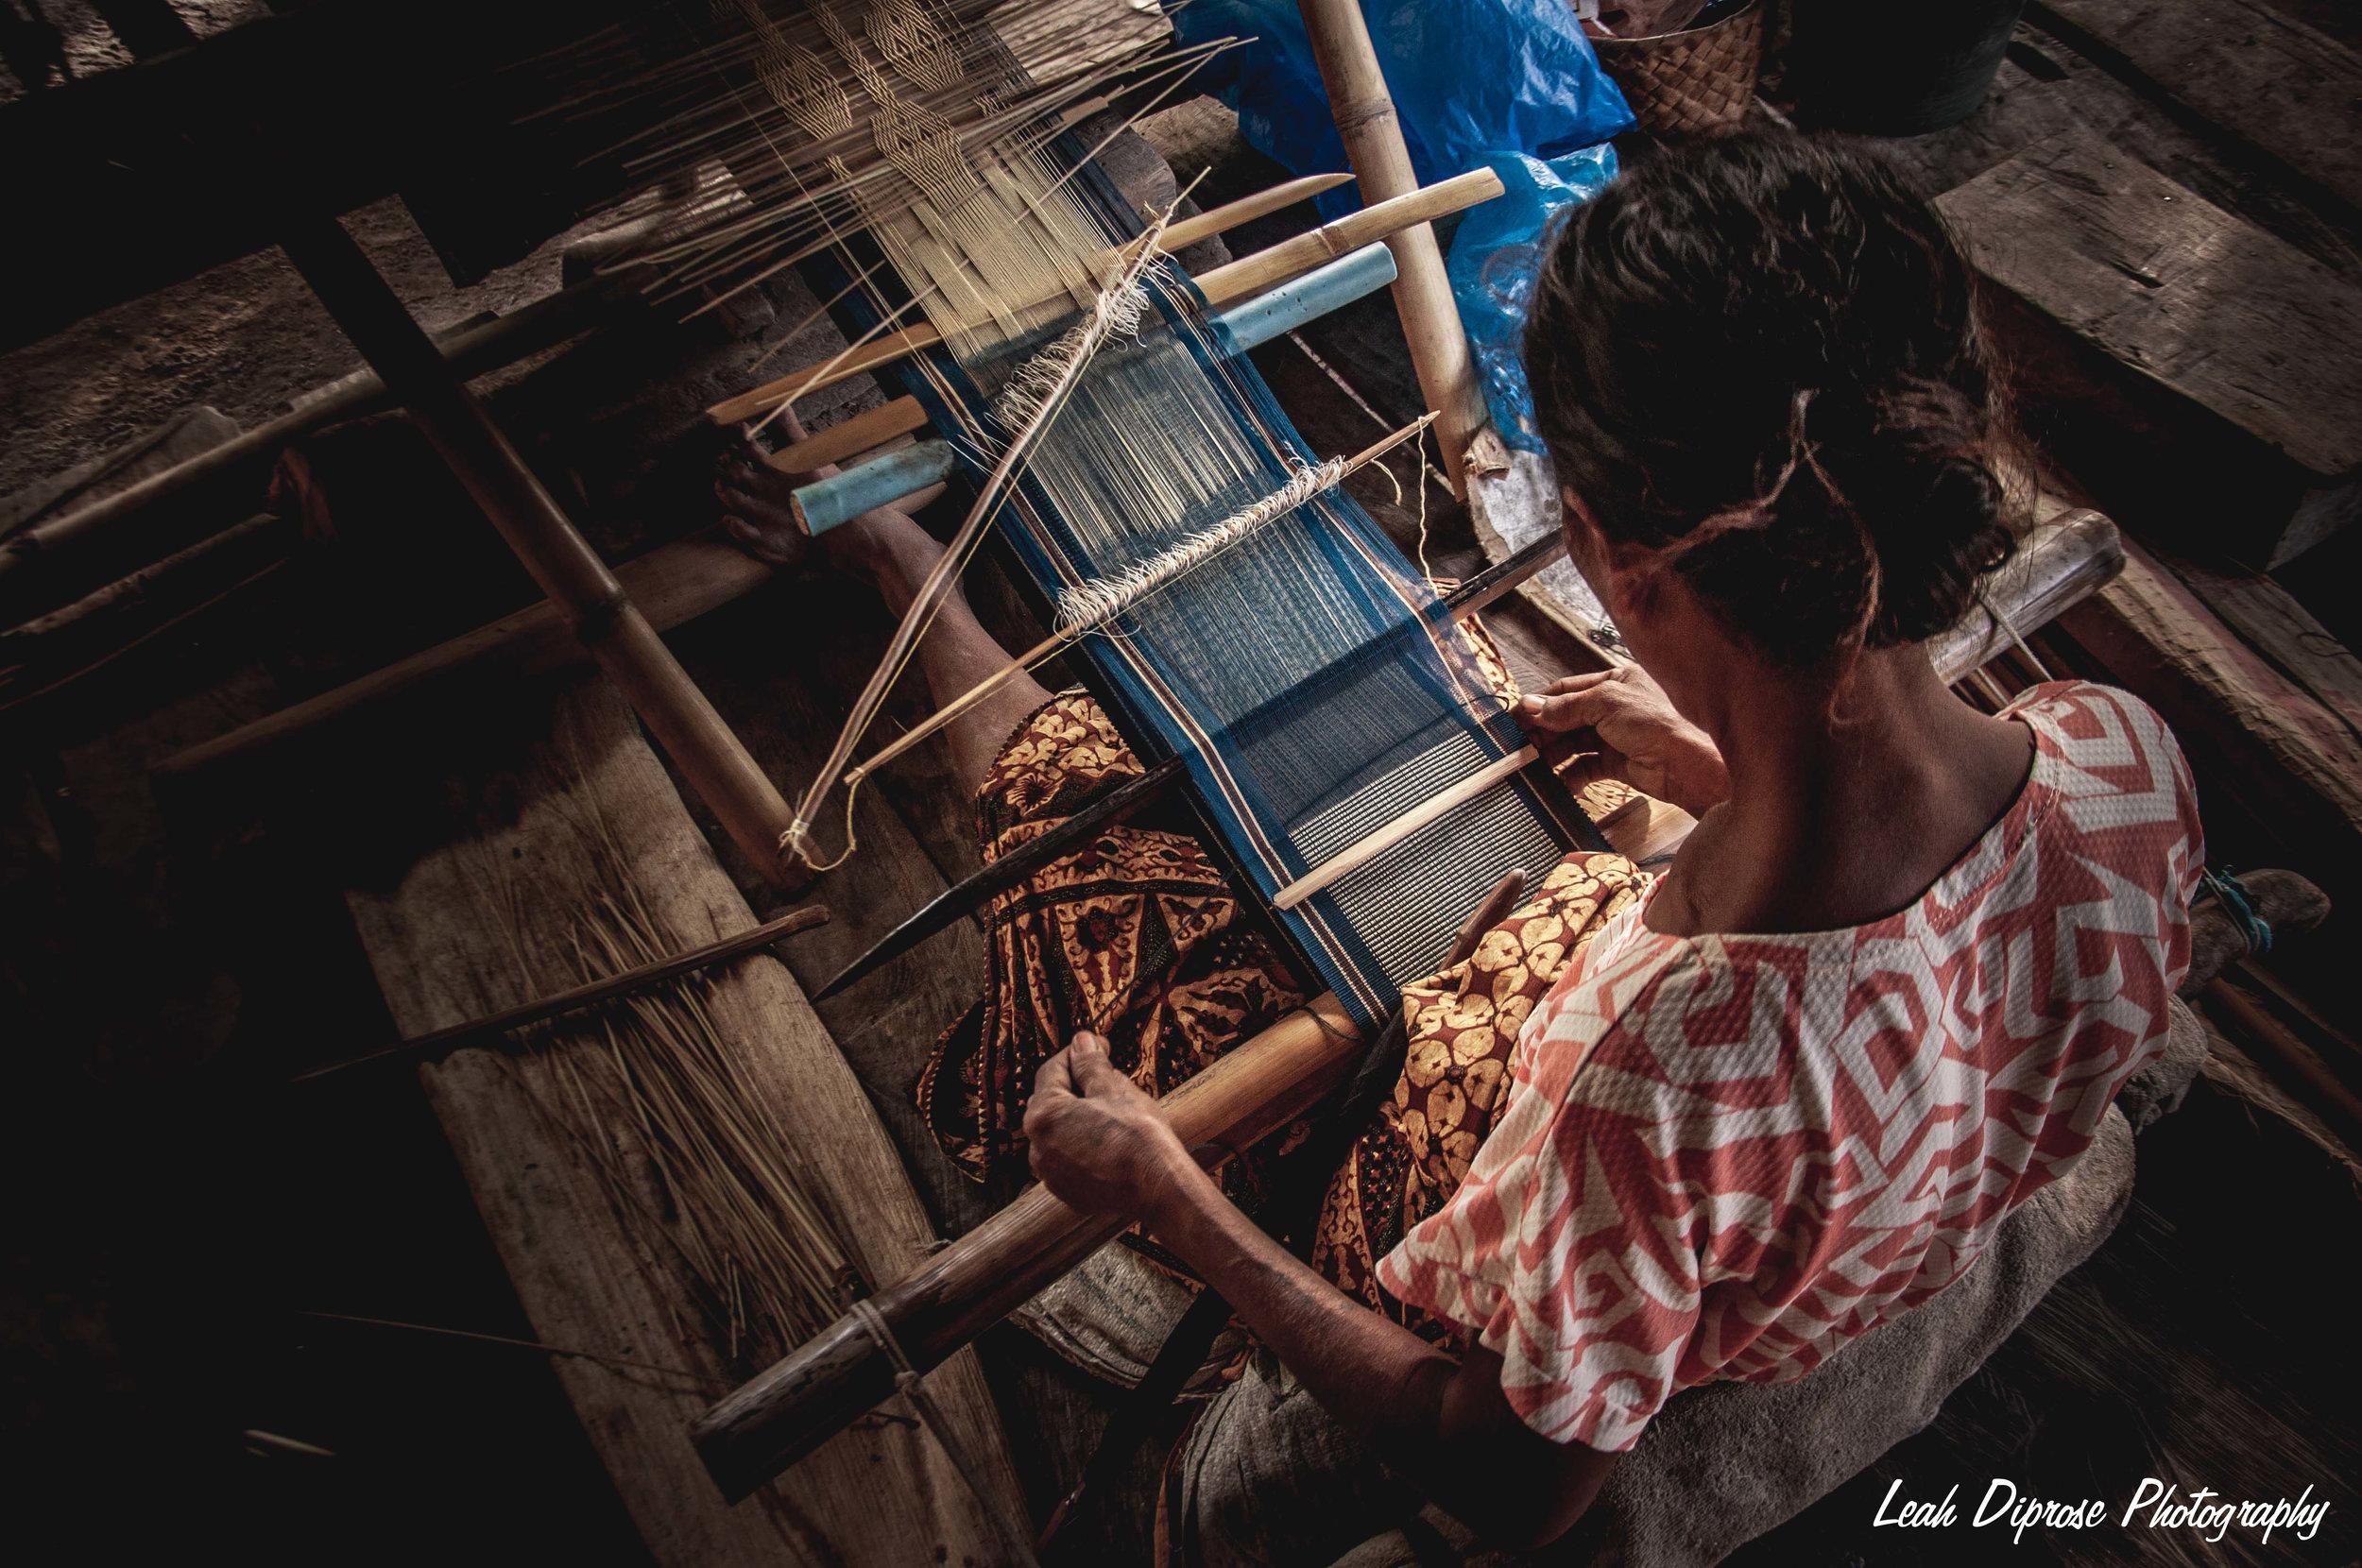 Leah Diprose Photography image-4959.jpg